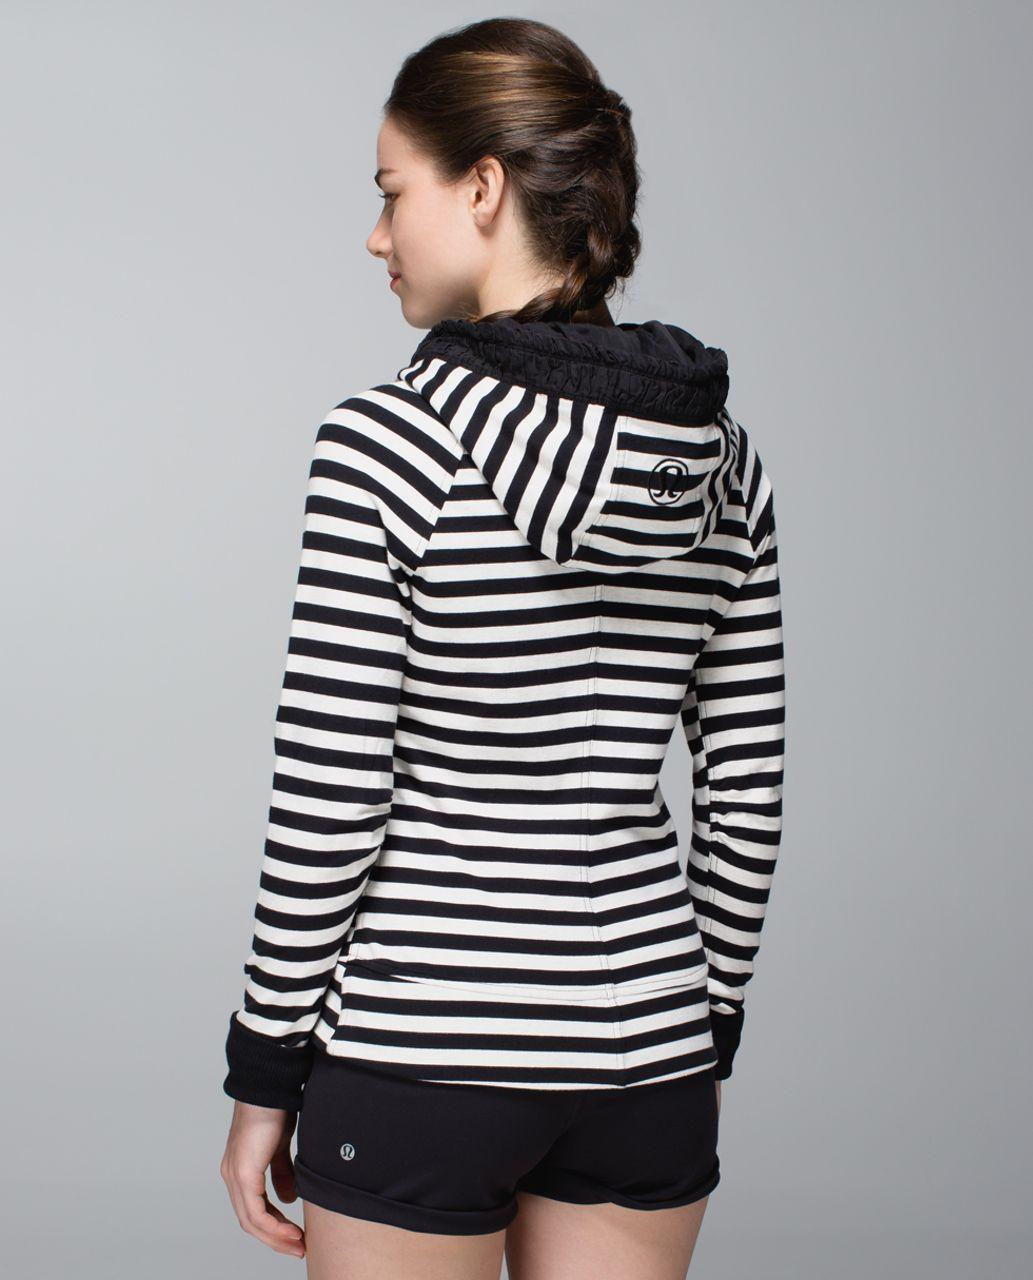 4894742671 Lululemon Movement Jacket - Apex Stripe Black Heathered Angel White / Black